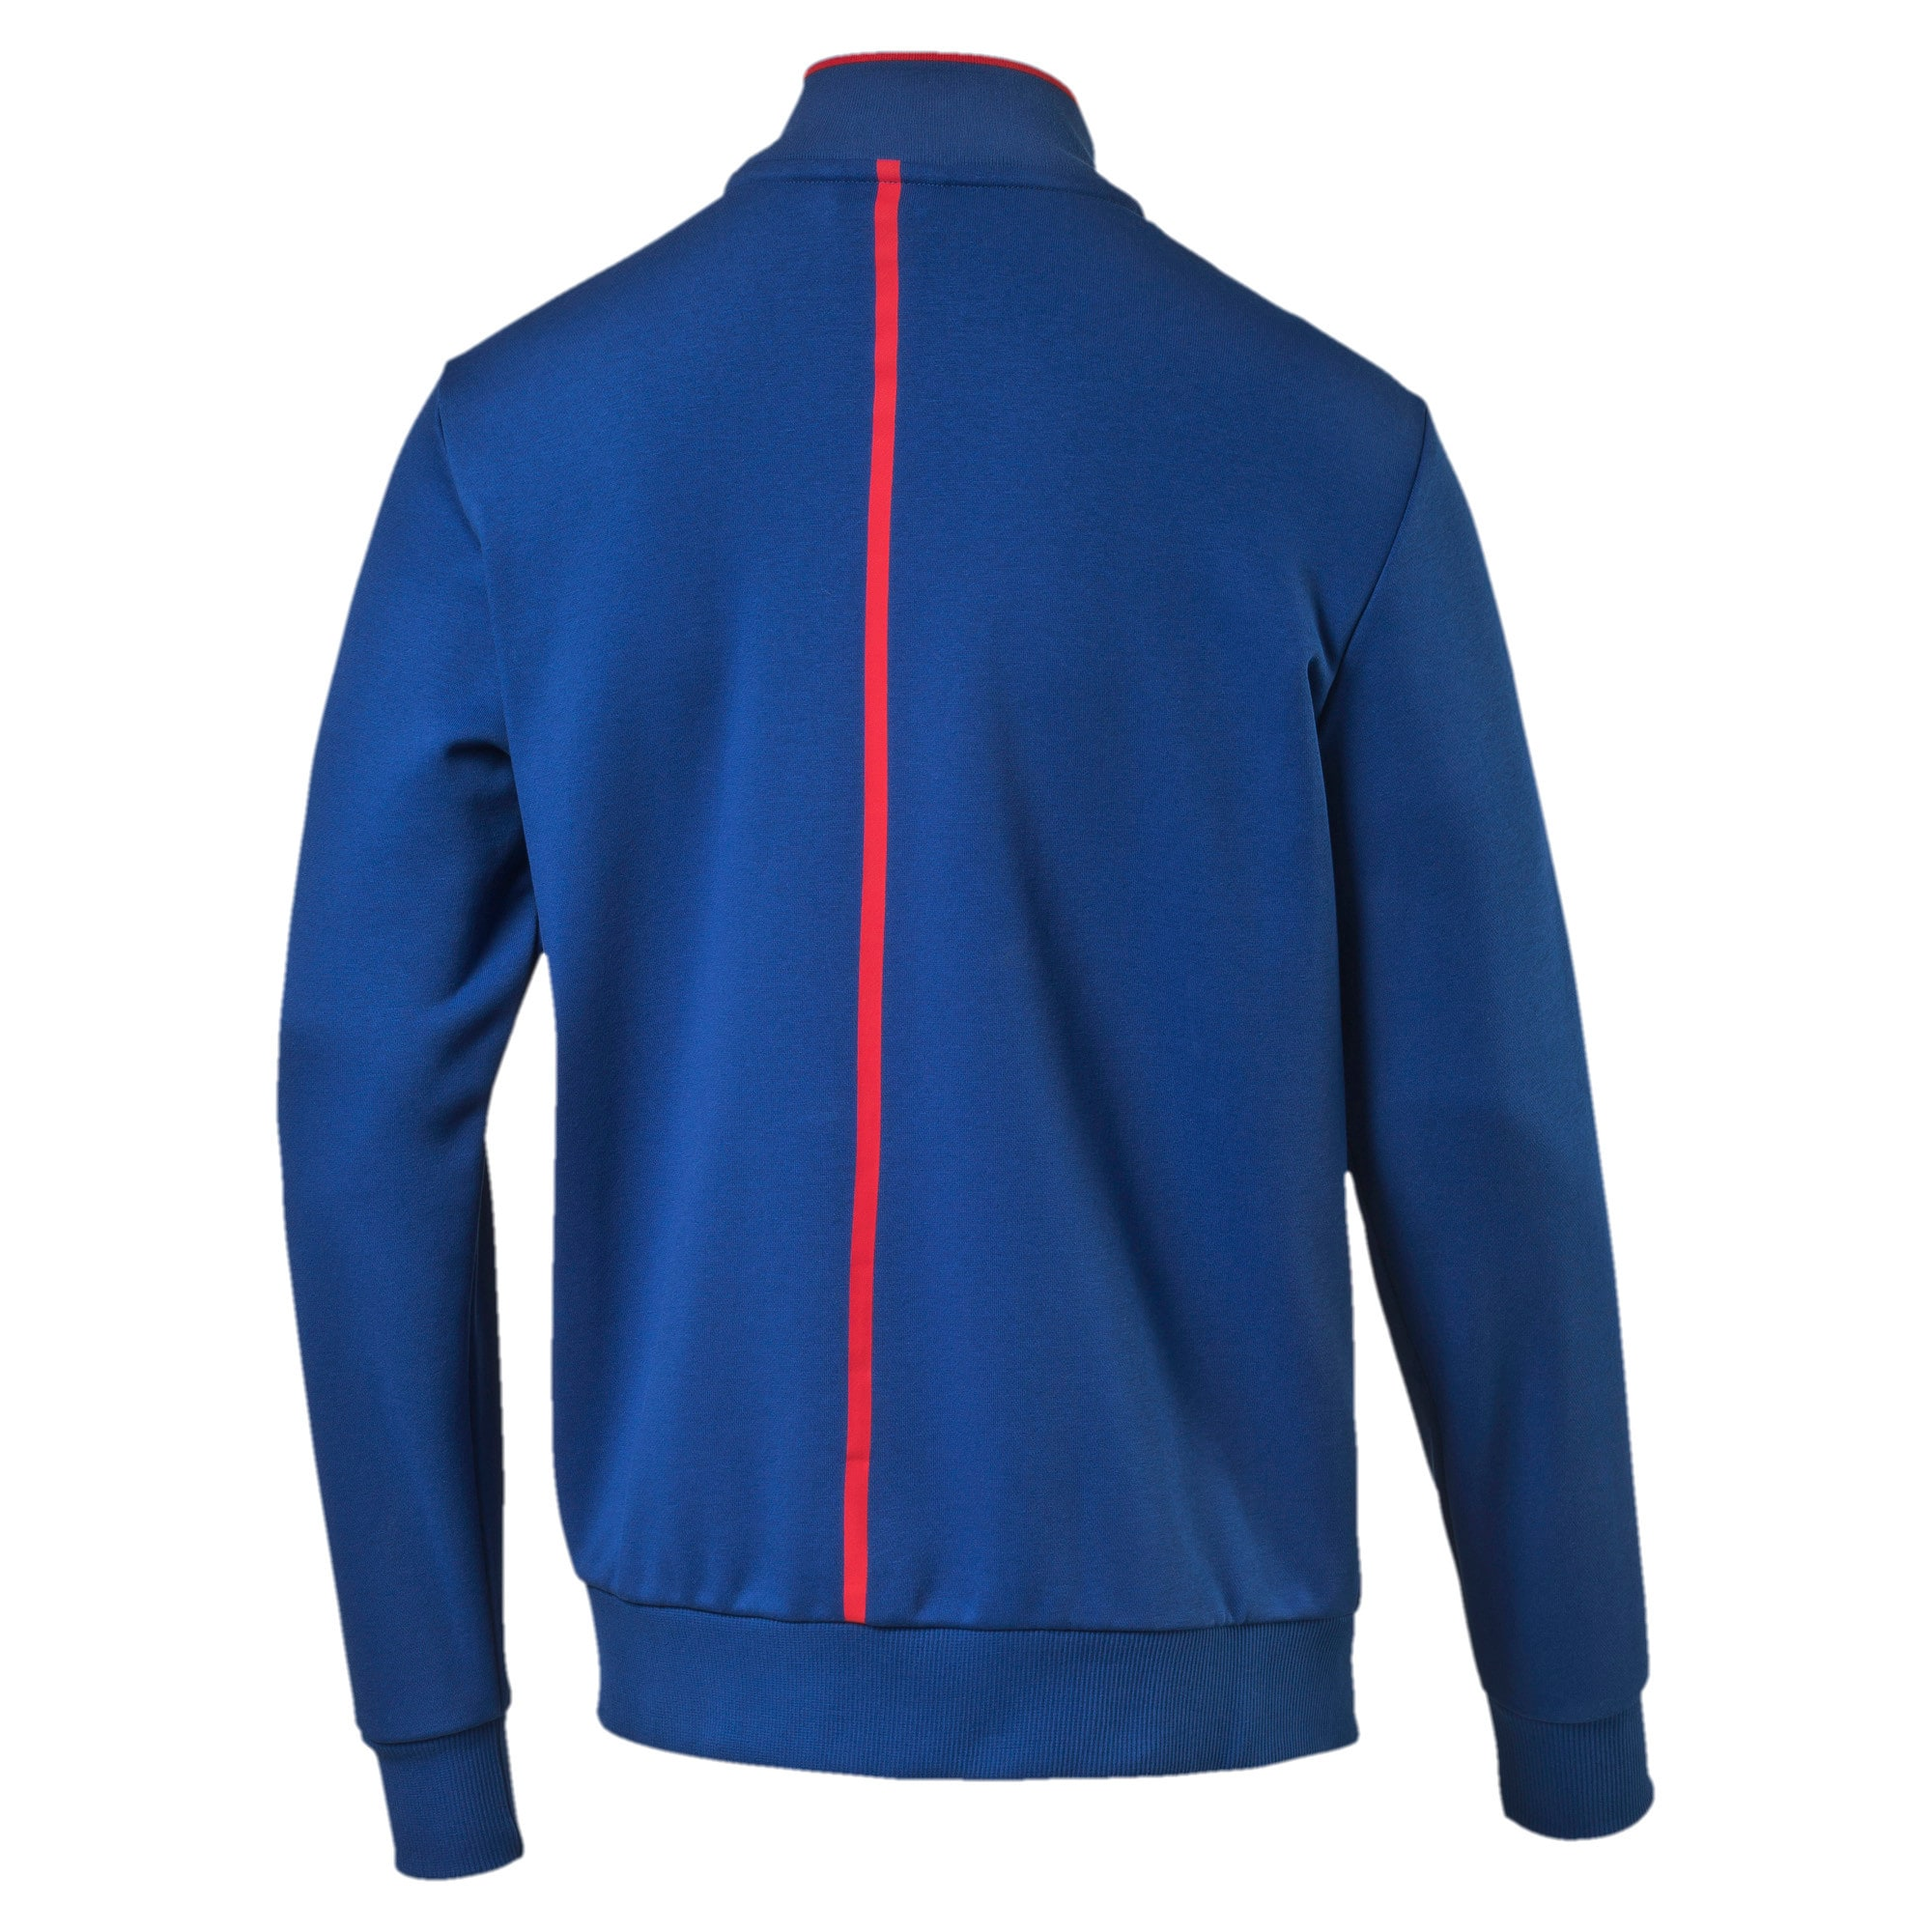 Thumbnail 4 of Ferrari Men's Sweat Jacket, Limoges, medium-IND